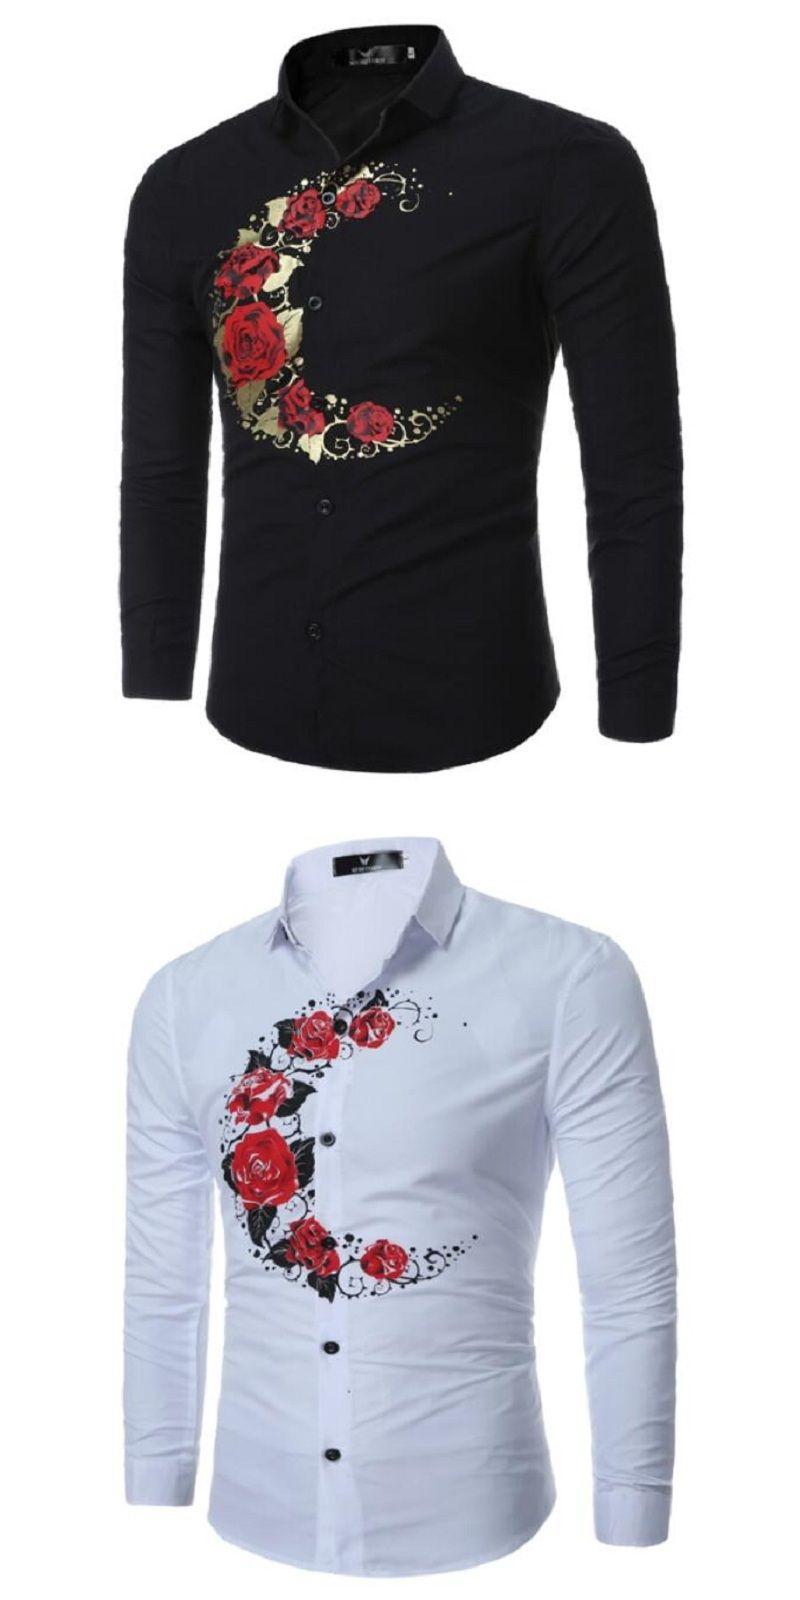 Long Sleeve Shirt Men 2017 Autumn New Fashion Designer High Quality